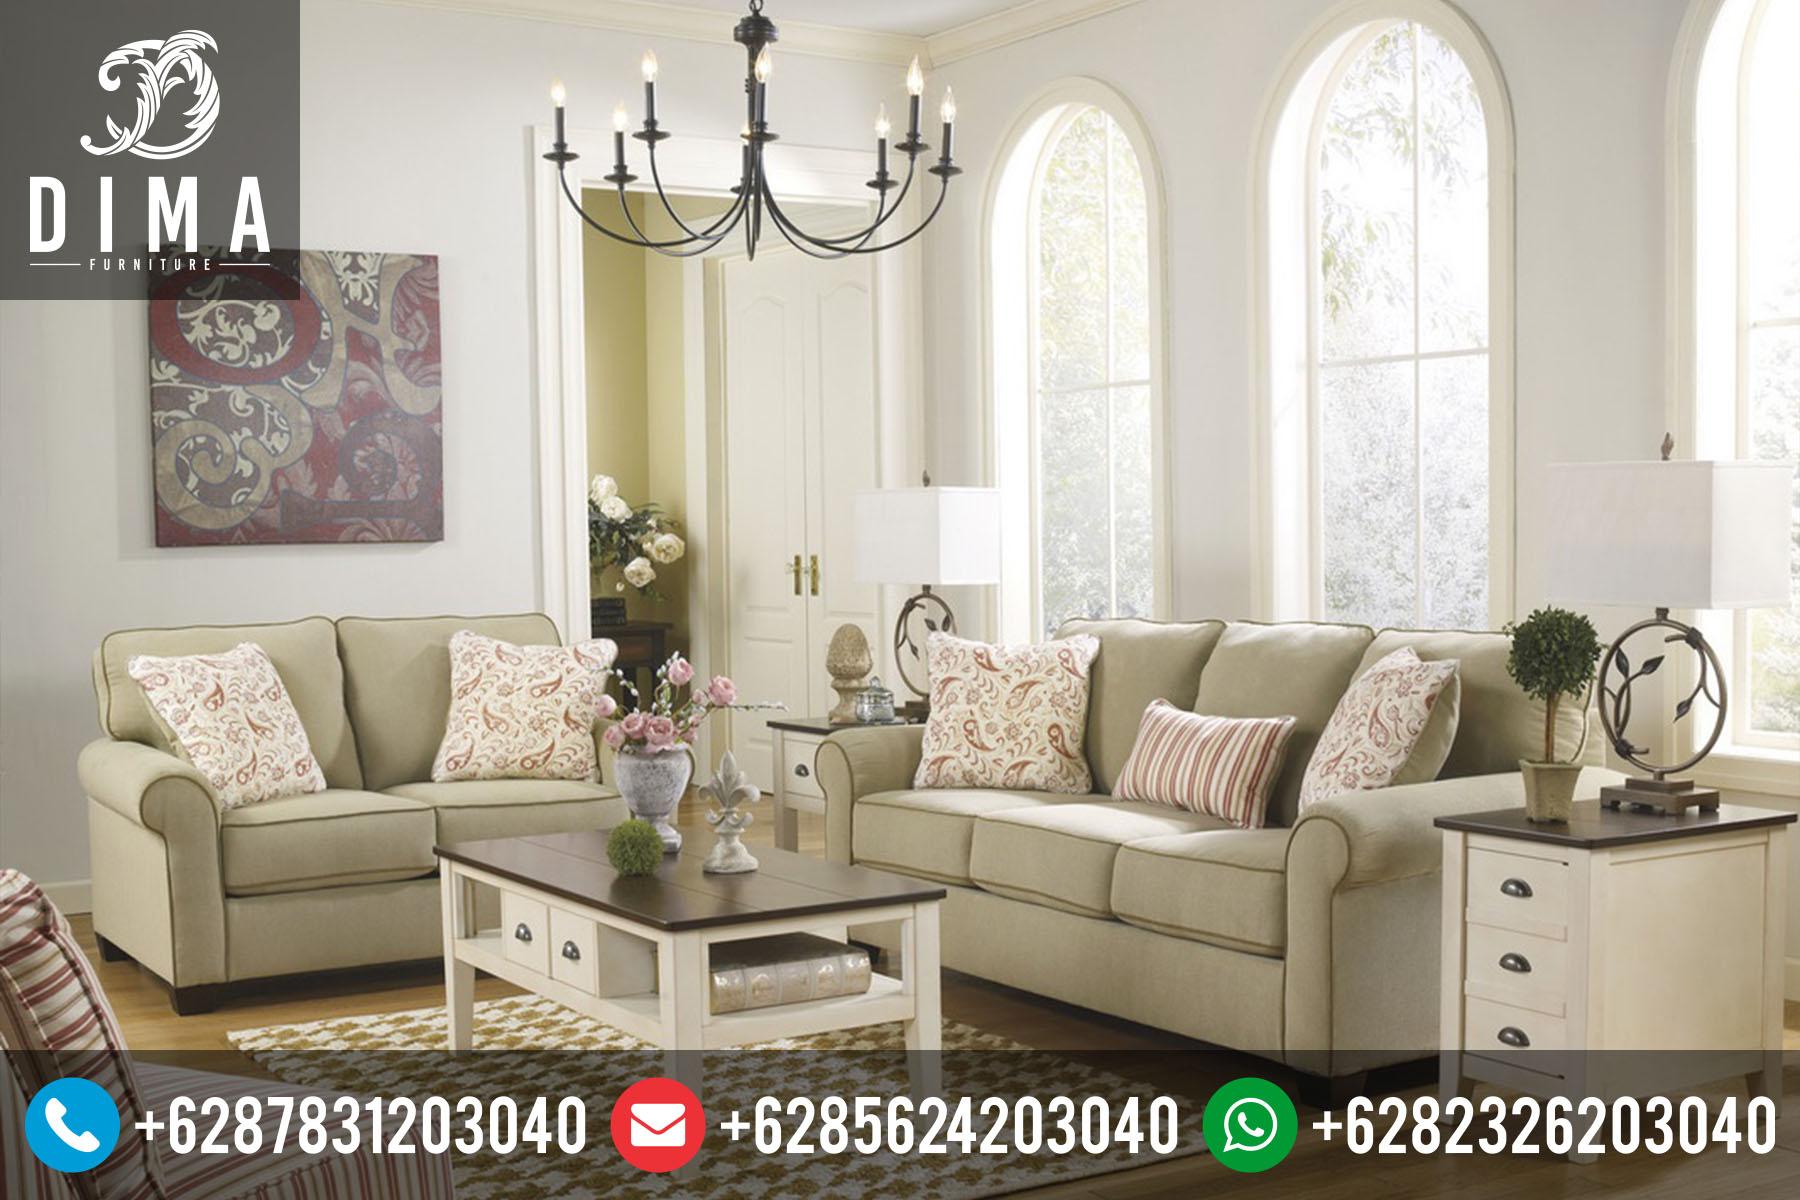 Set Sofa Tamu Minimalis Modern Cantik Terbaru Murah ST-0020